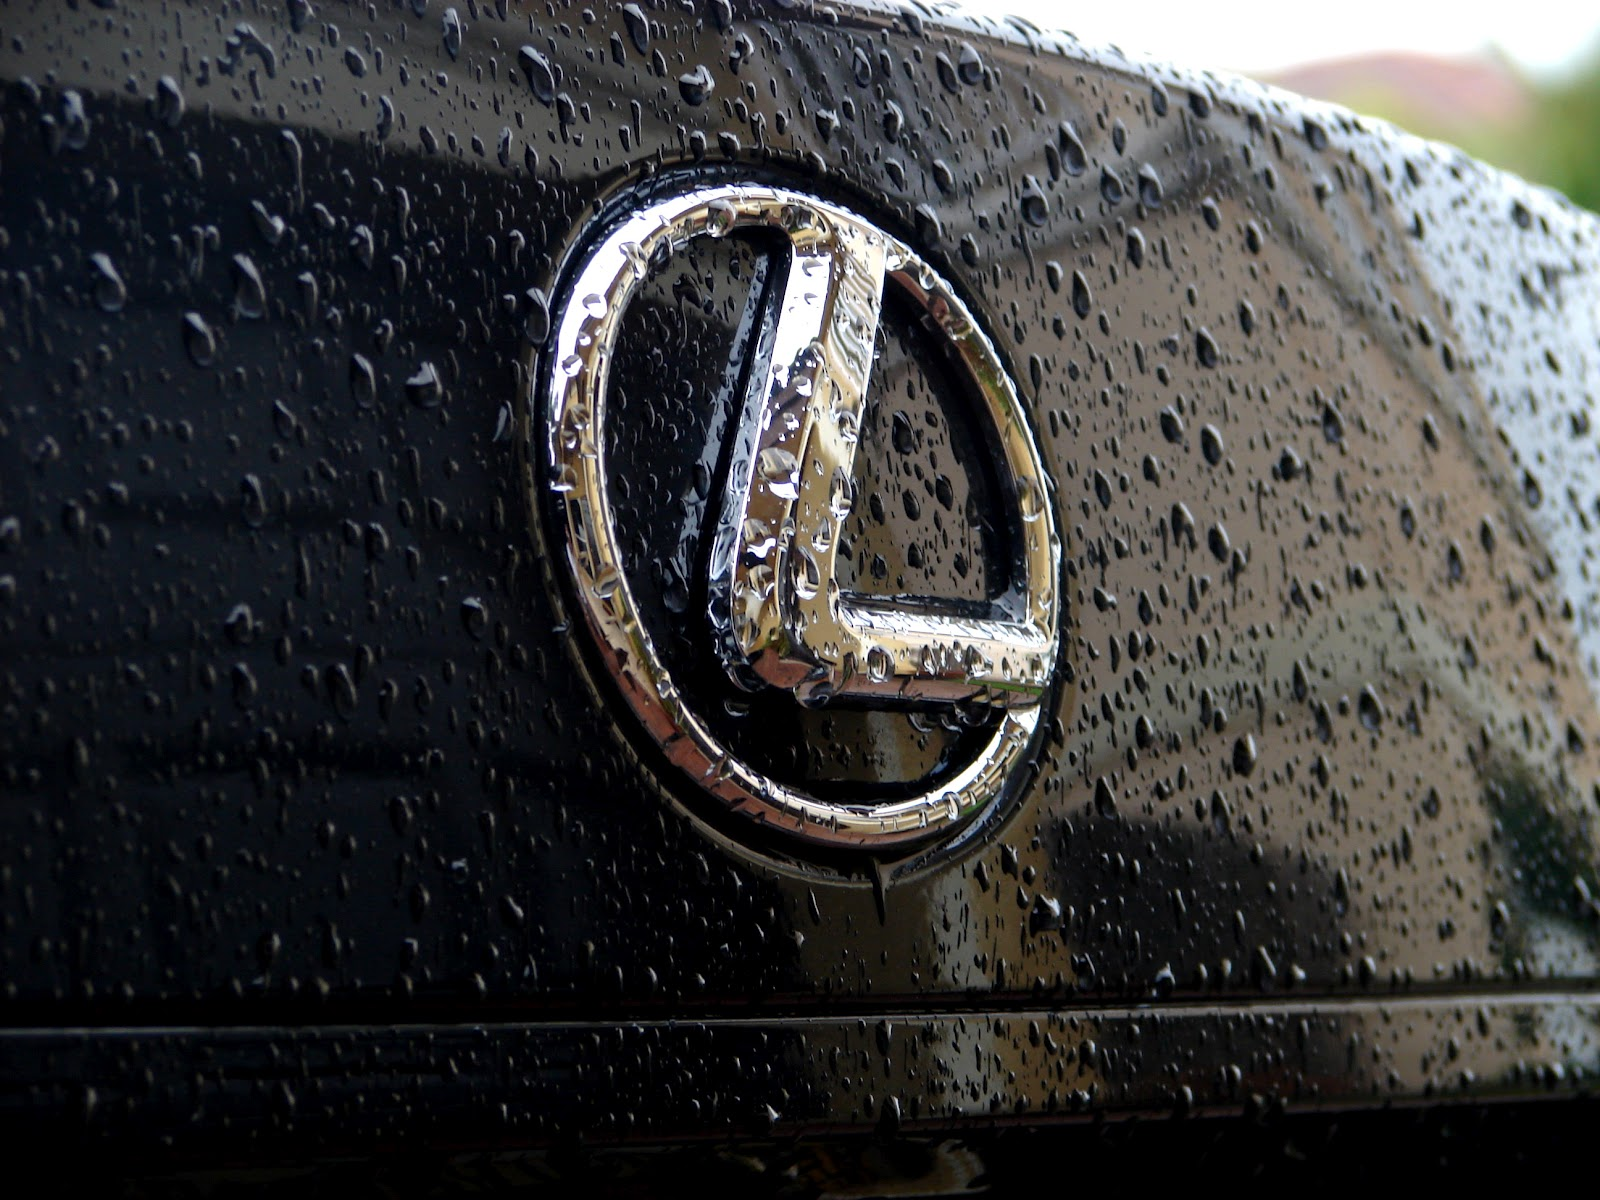 Lexus Car Wallpapers Hd A1 Wallpapers